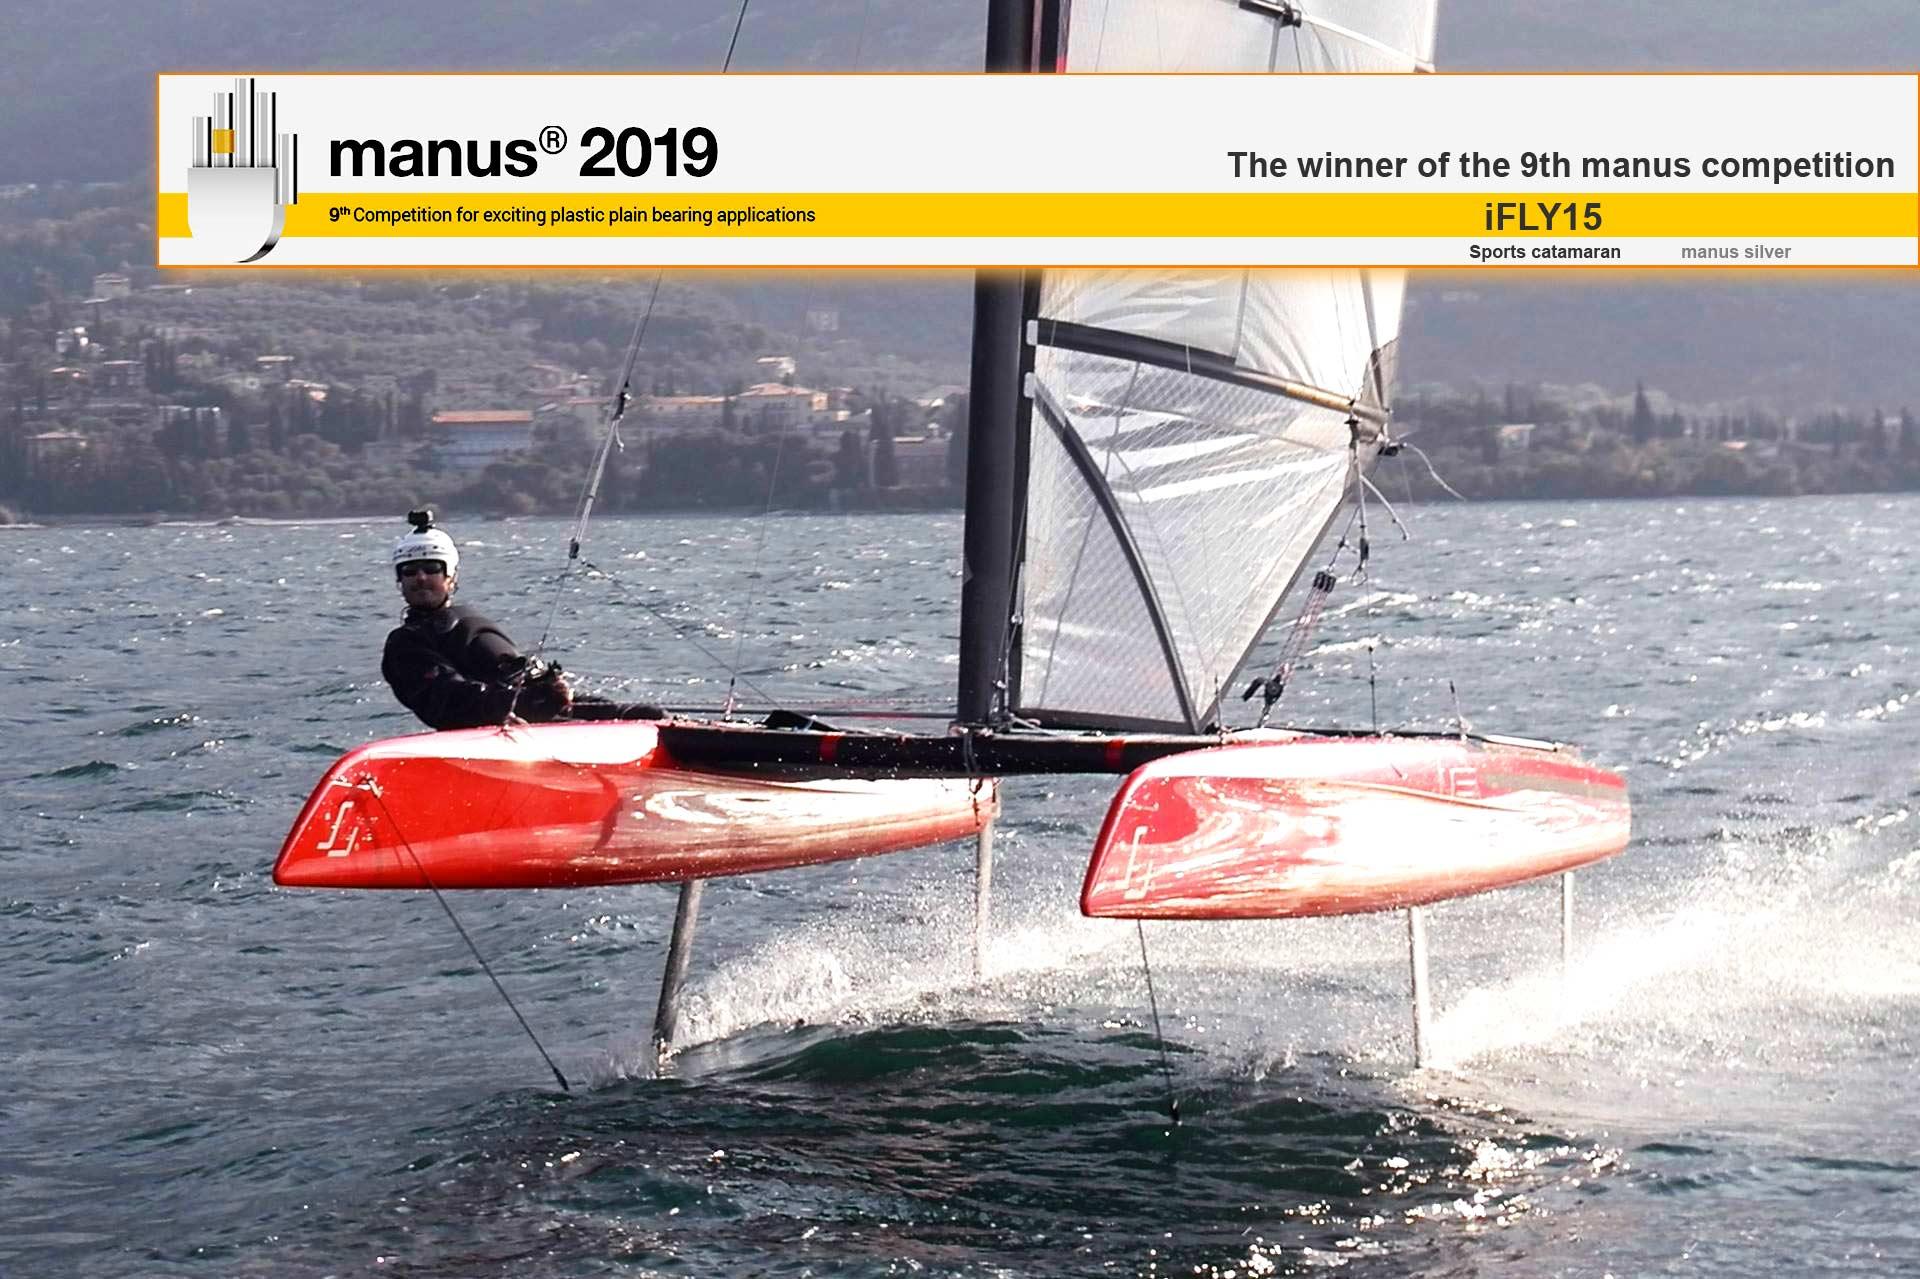 Innovation Award | Silver manus® 2019 – Sports catamaran